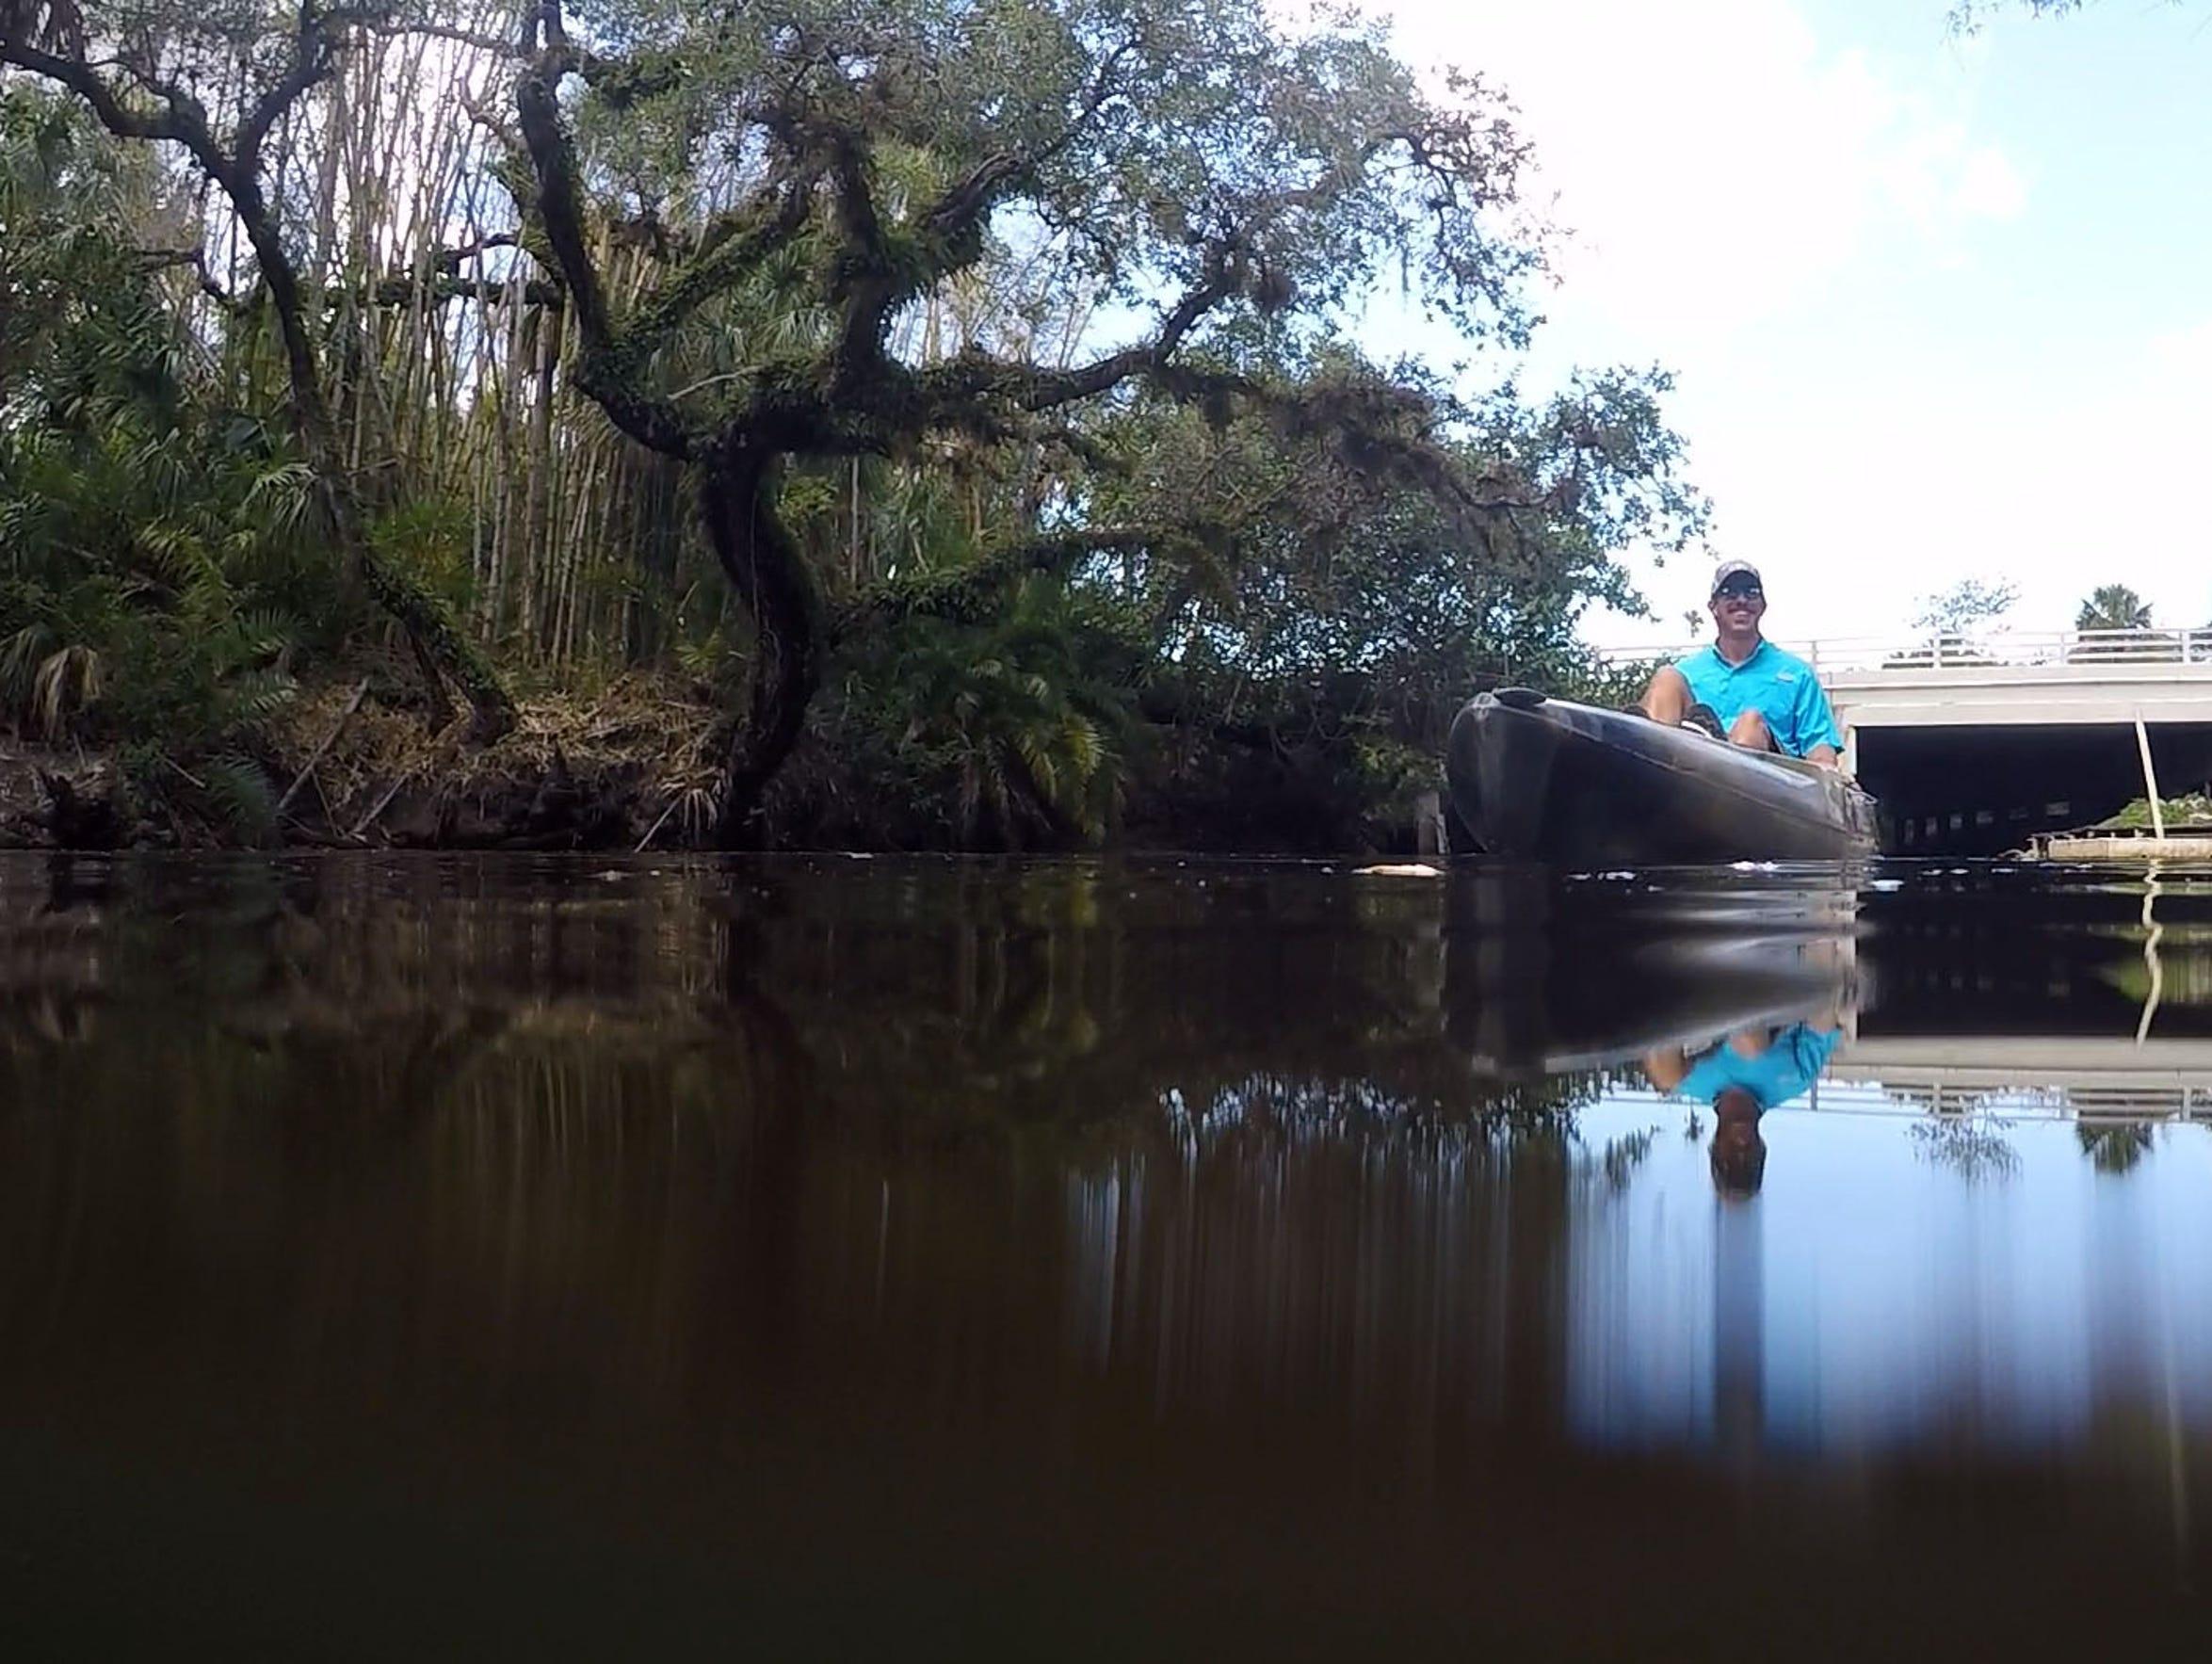 """The river itself is the lifeline of Estero,"" said"